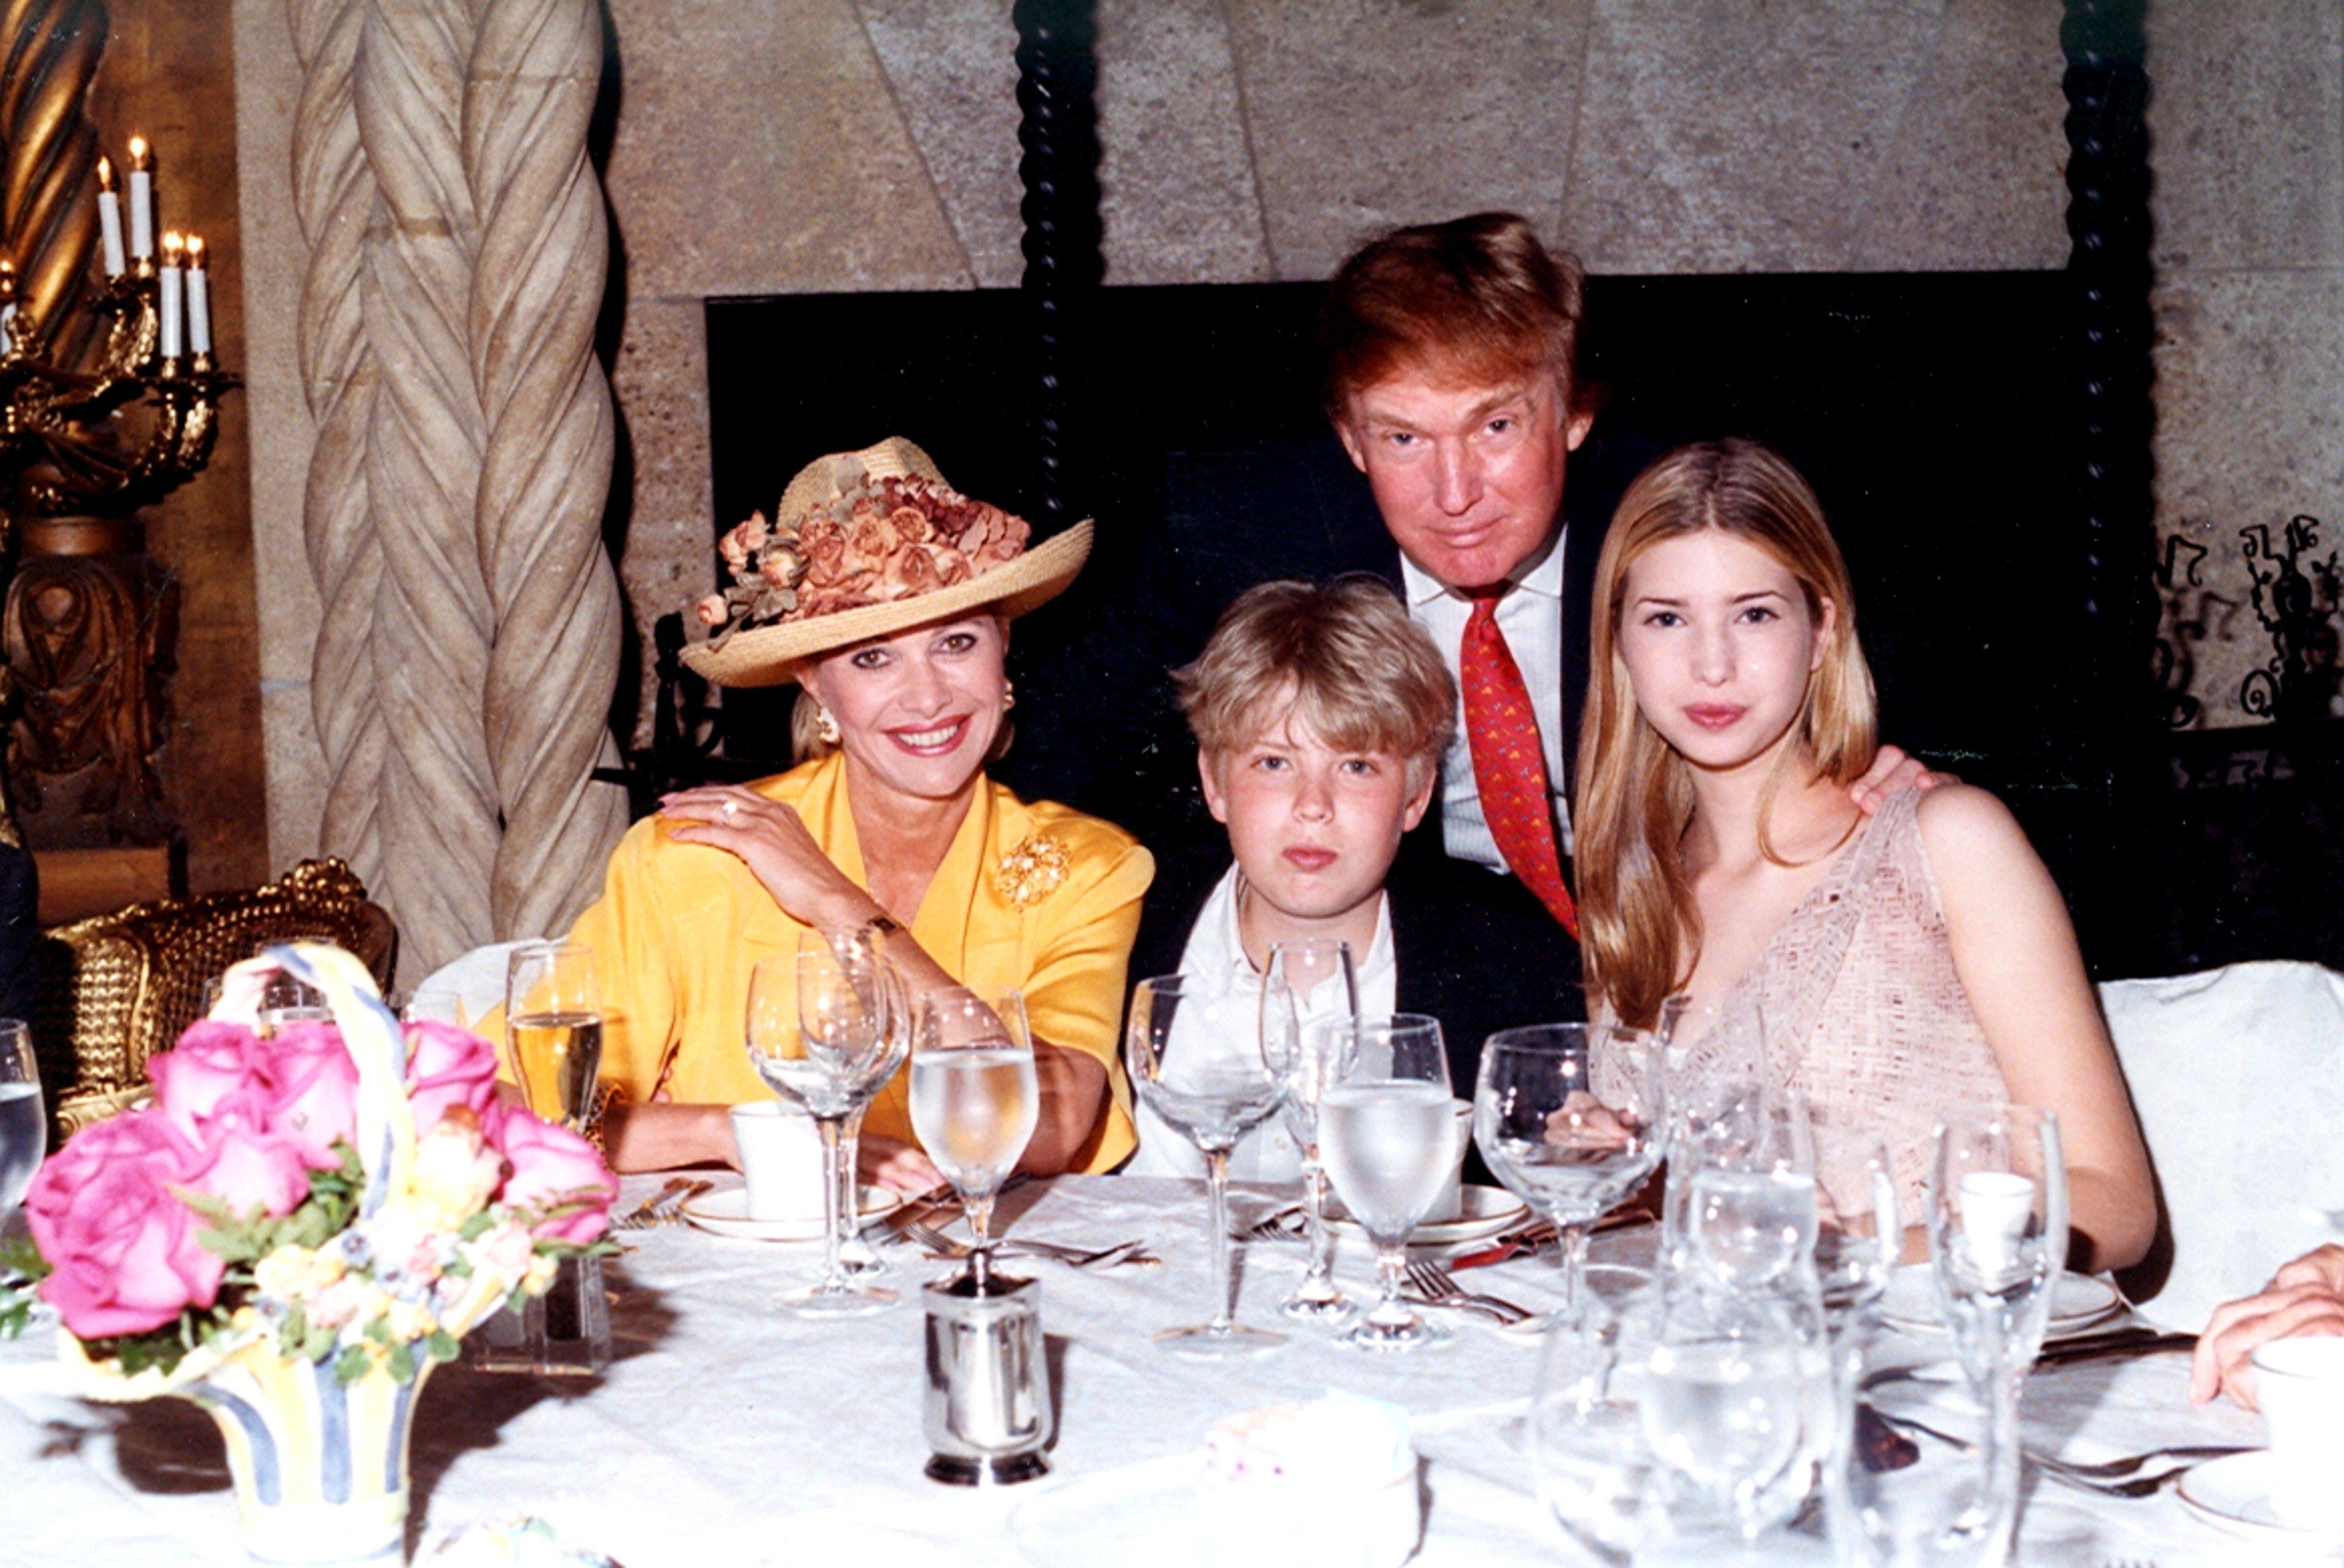 Donald Trump, his first wife Ivana Trump and kids Ivanka and Eric.